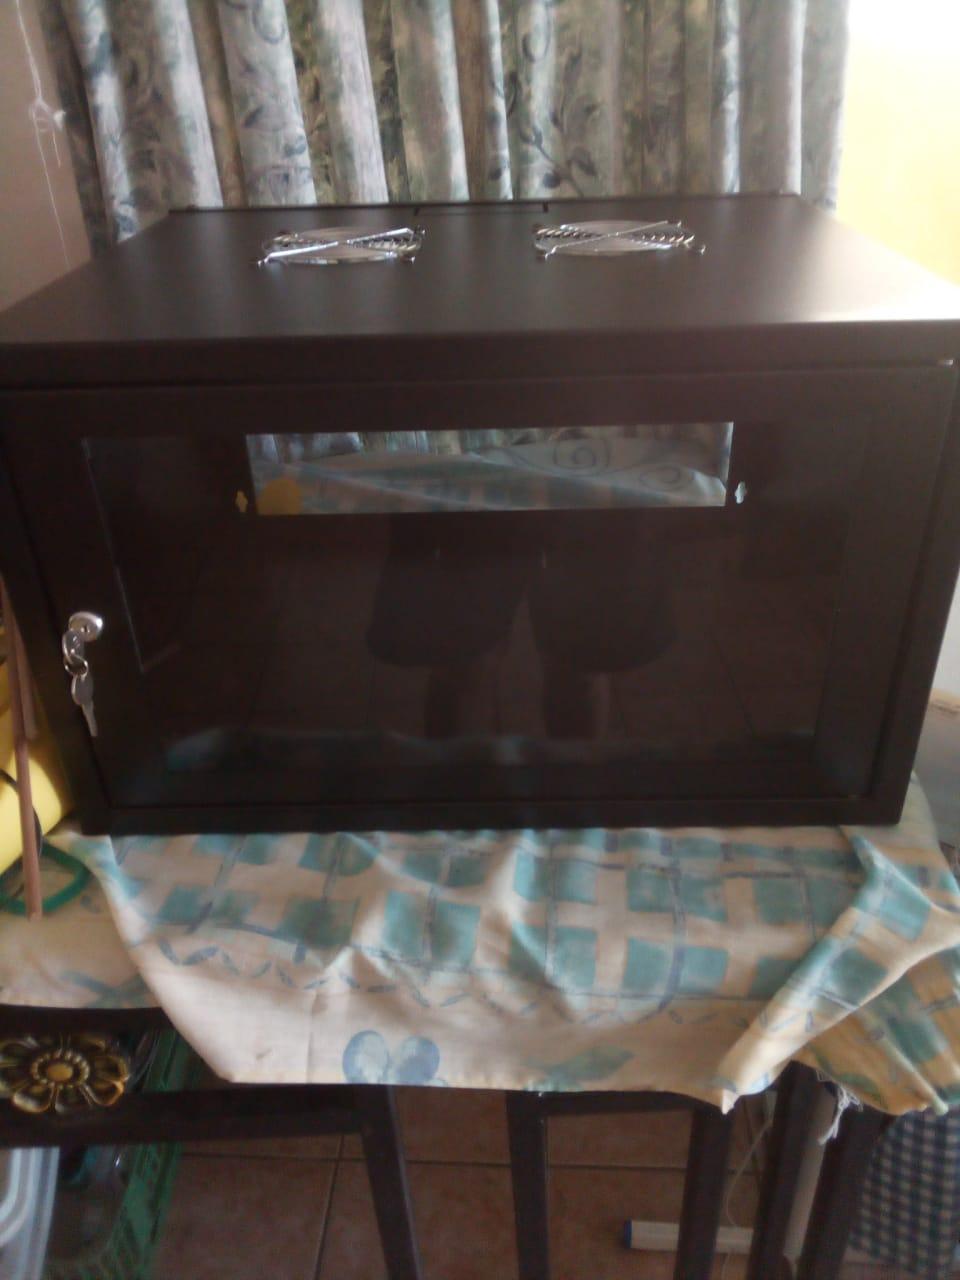 6u wallbox / network cabinets / server racks for sale. Black with glass doors. Brand new